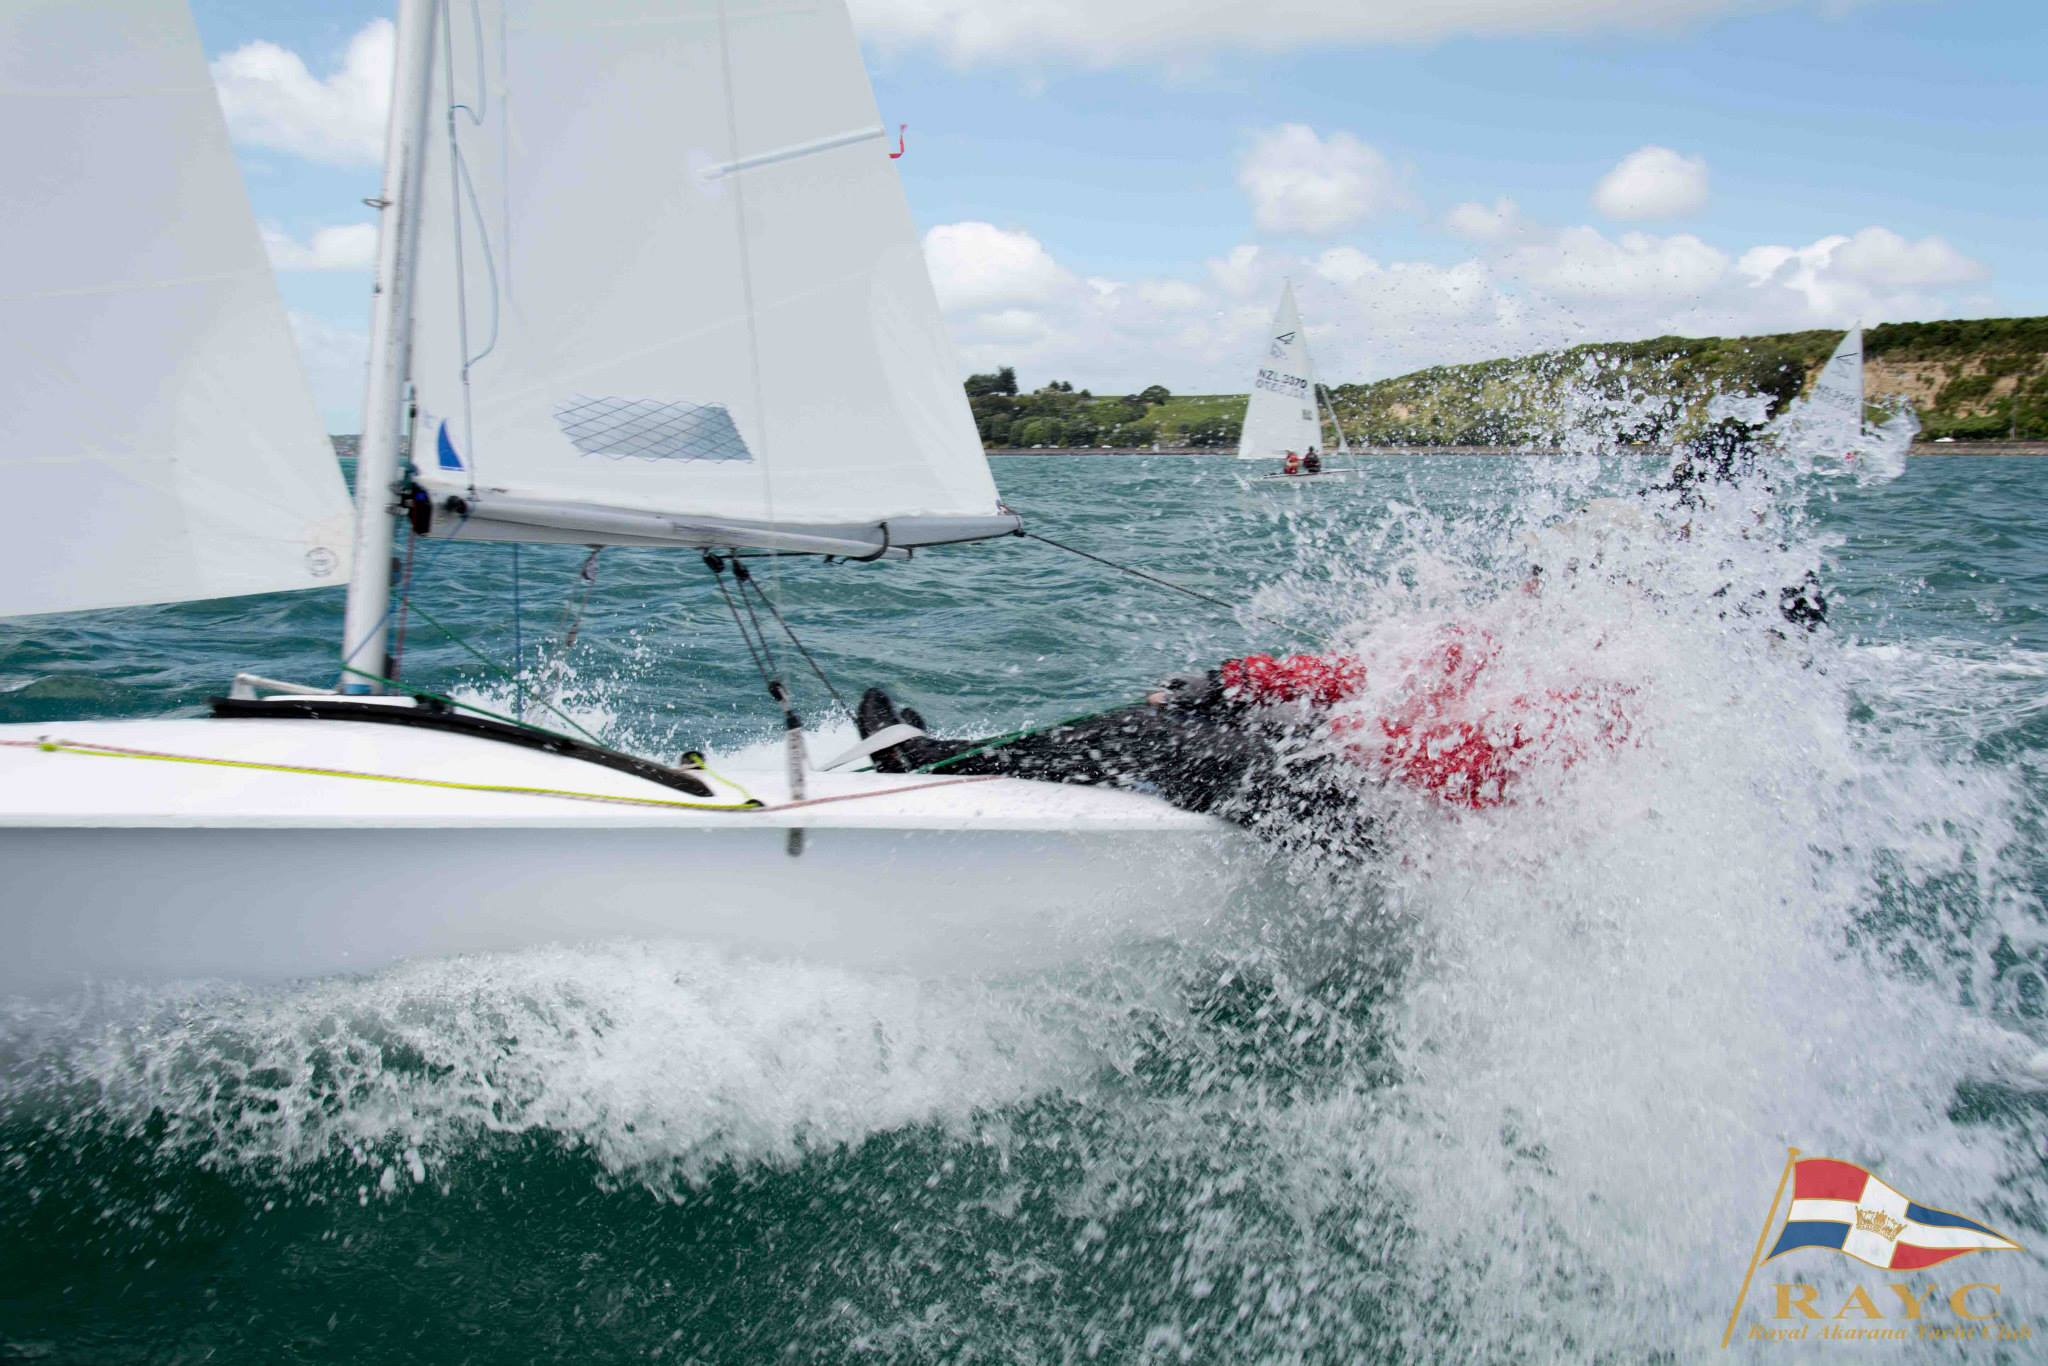 The Boat Builders Summer Series - Starting Handicaps